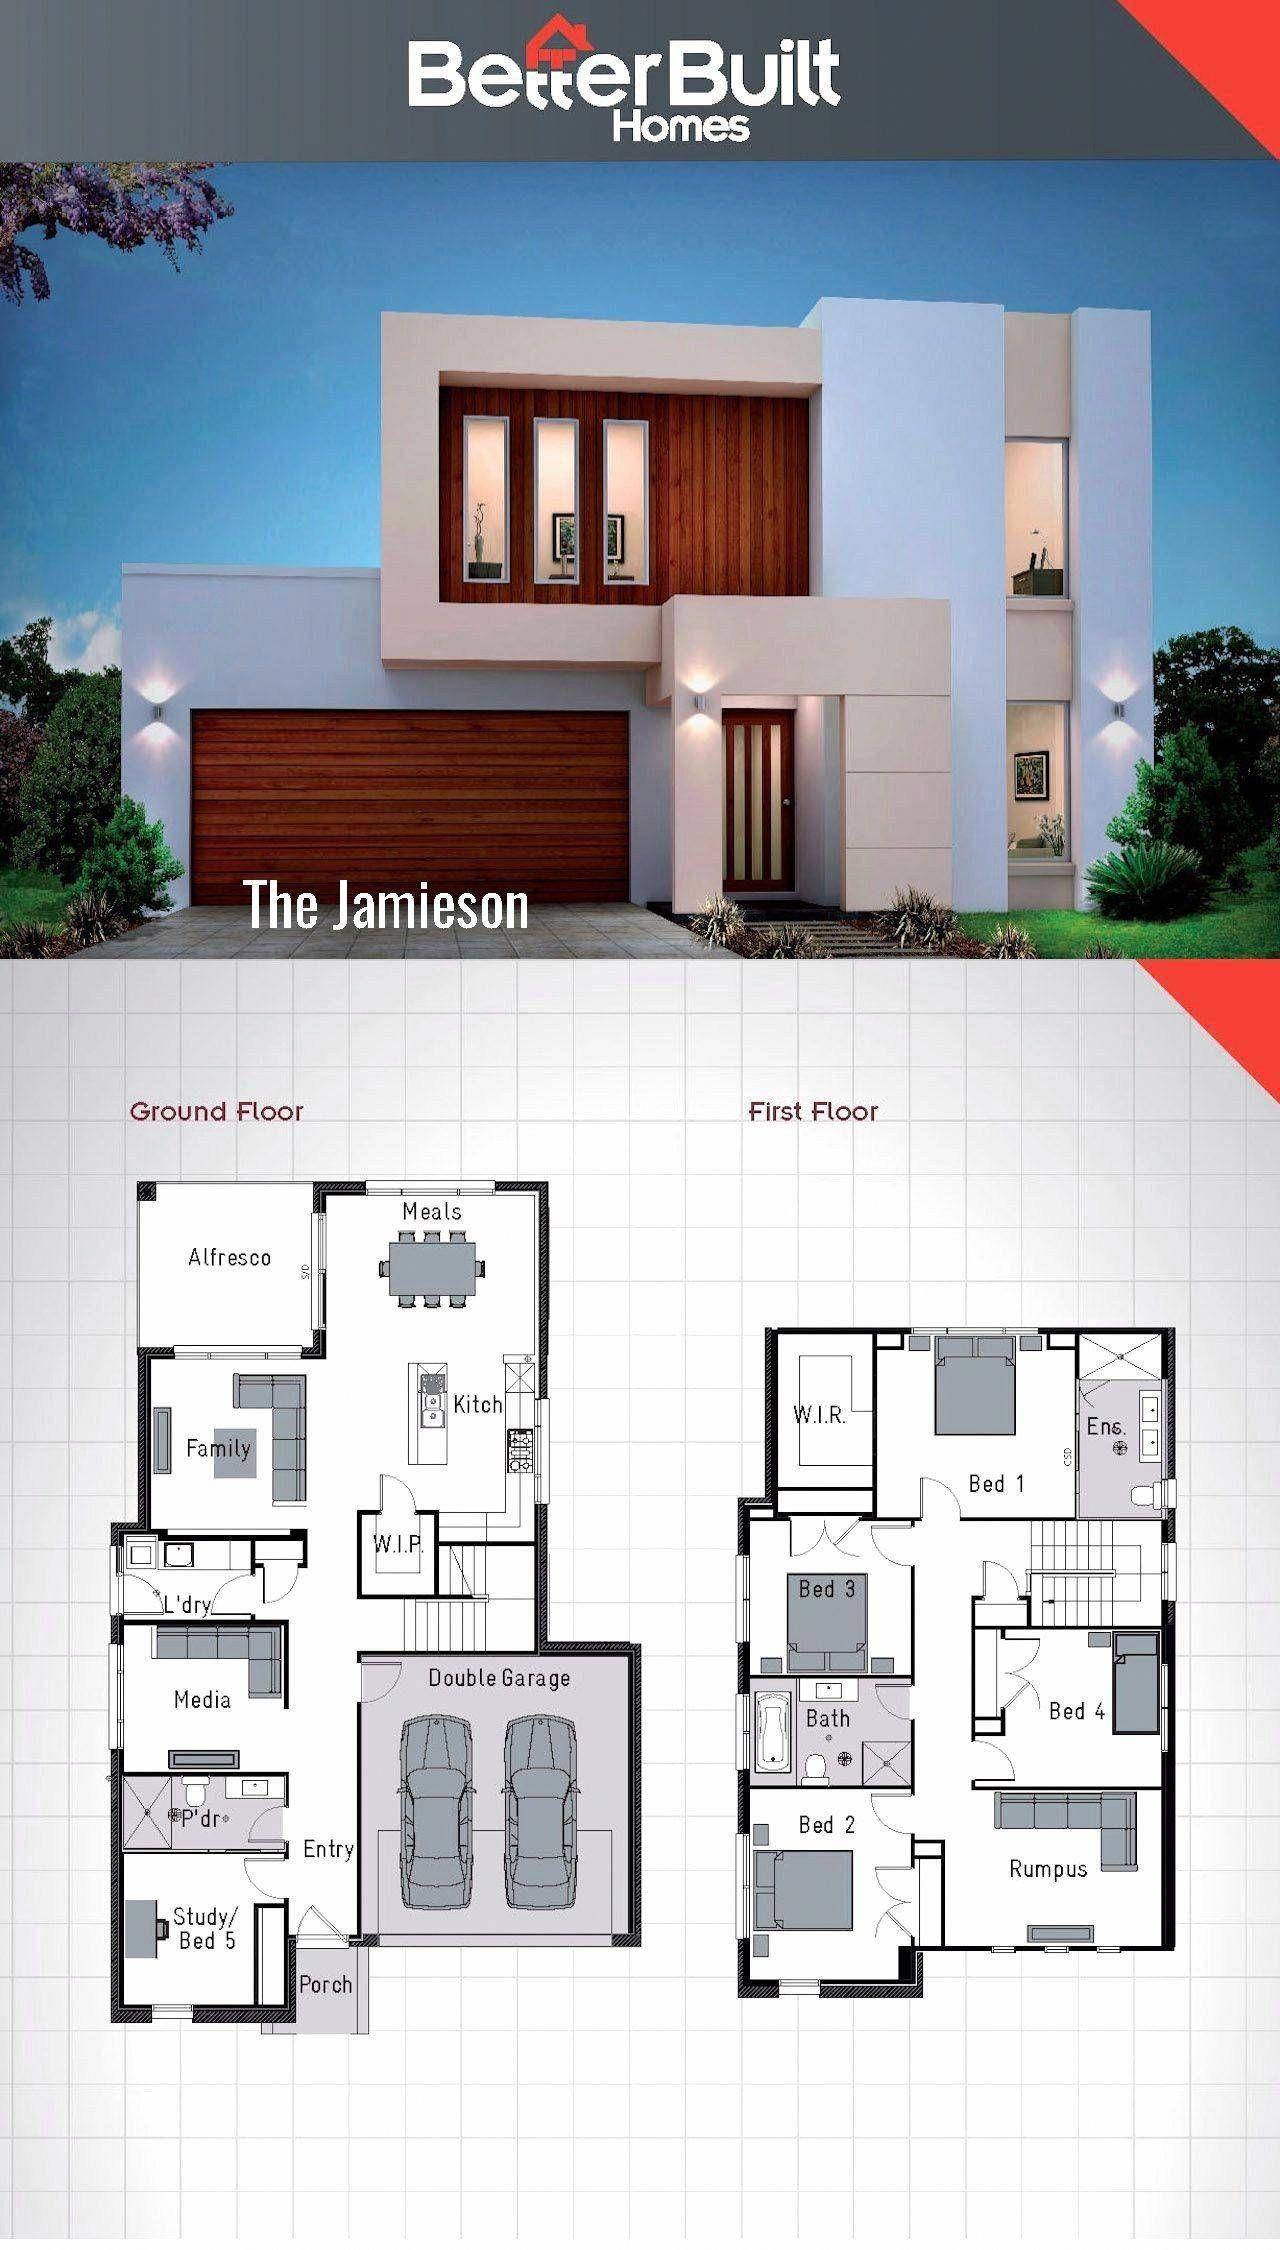 Homedecor Interiordesign Interior Home Decor Design Homedesign Handmade Homesweetho Double Storey House 2 Storey House Design Modern House Design